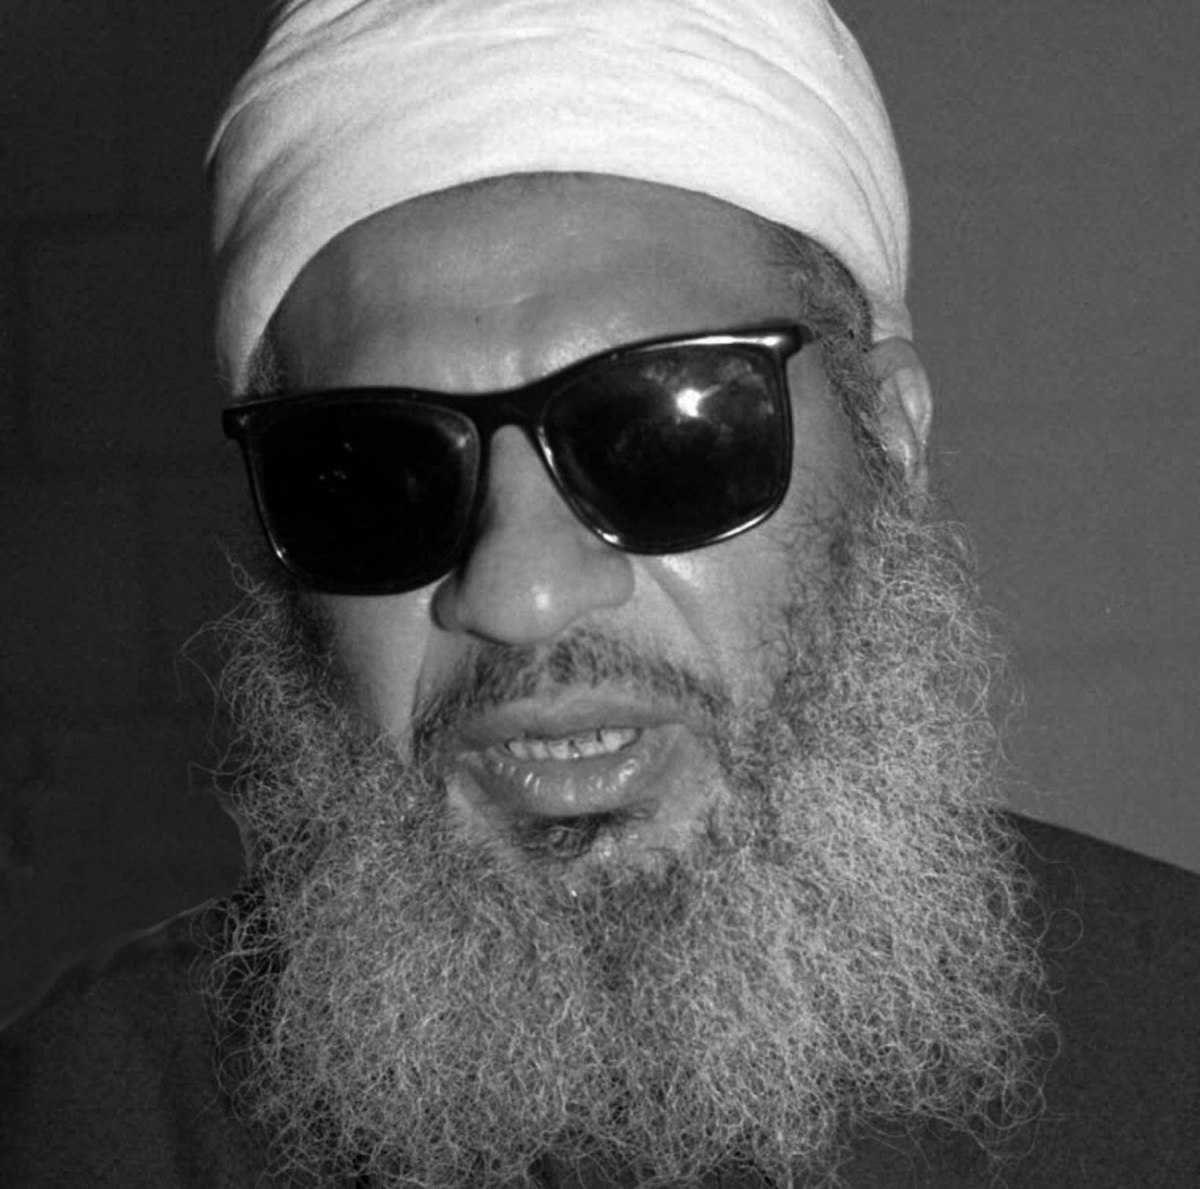 Omar Abdel Rahman, Brooklyn terrorist theologian dies in prison